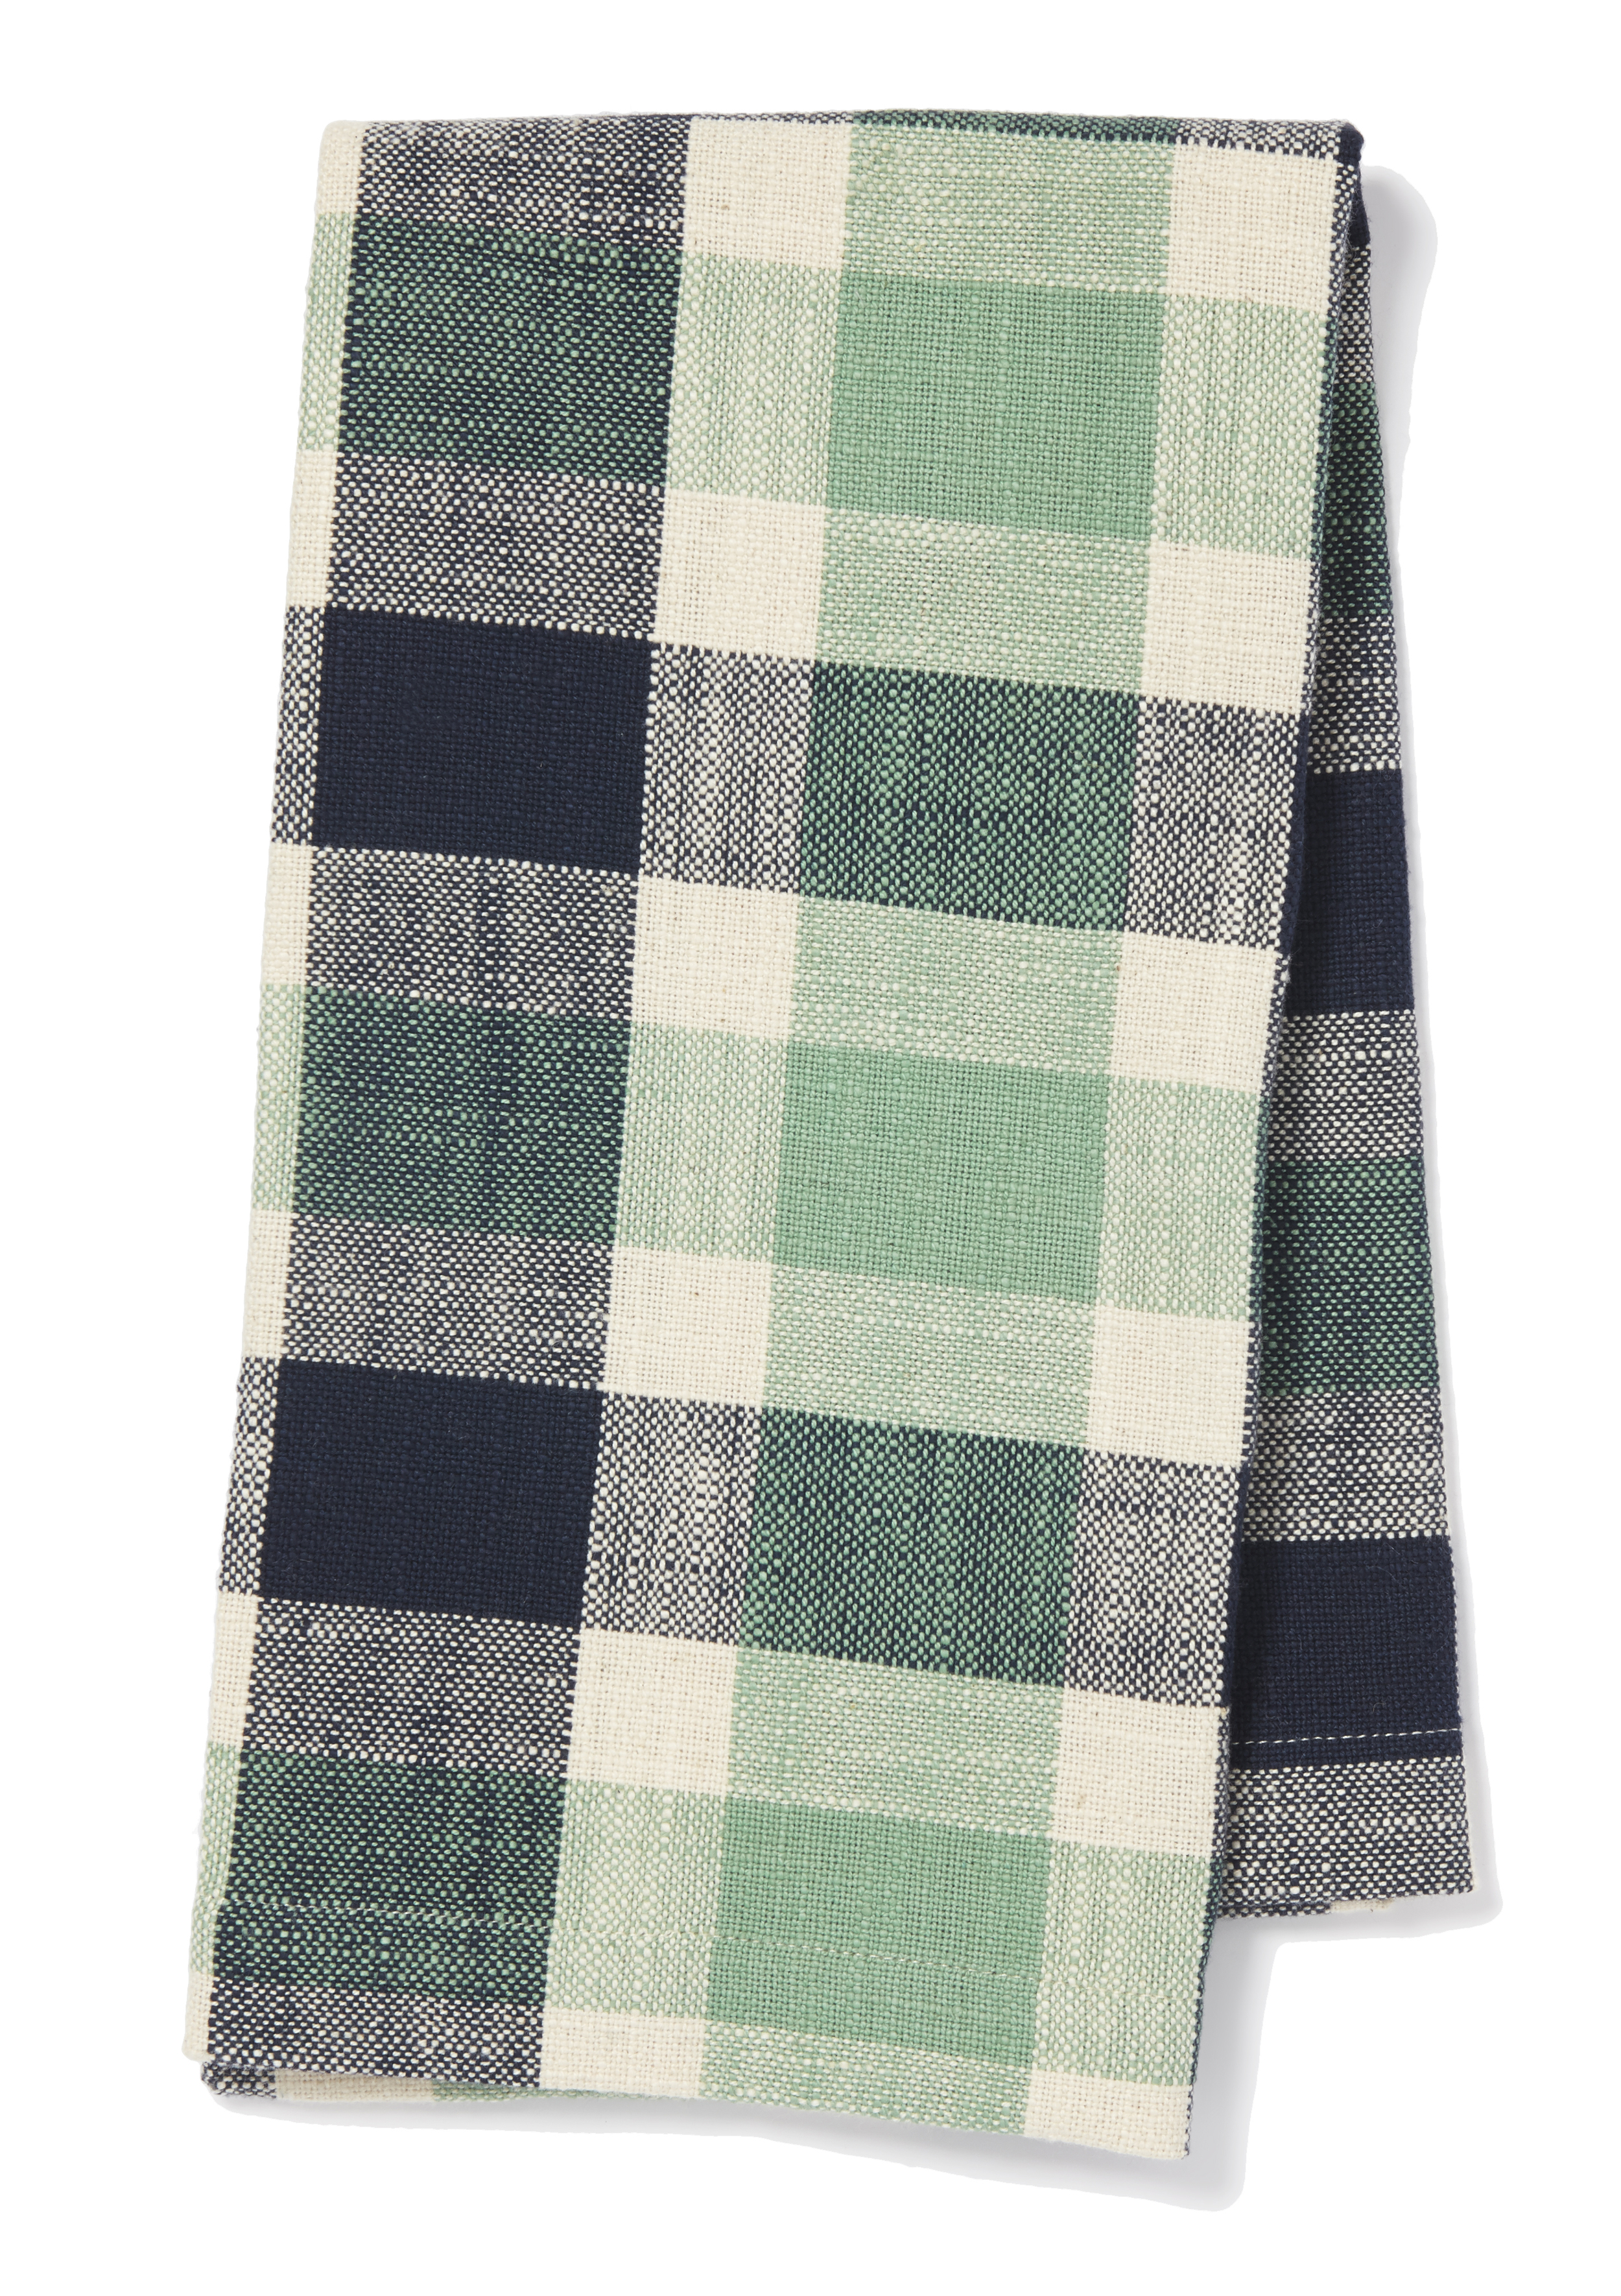 SLCT02_Indigo Grass Slubby Cotton Tea Towel.jpg